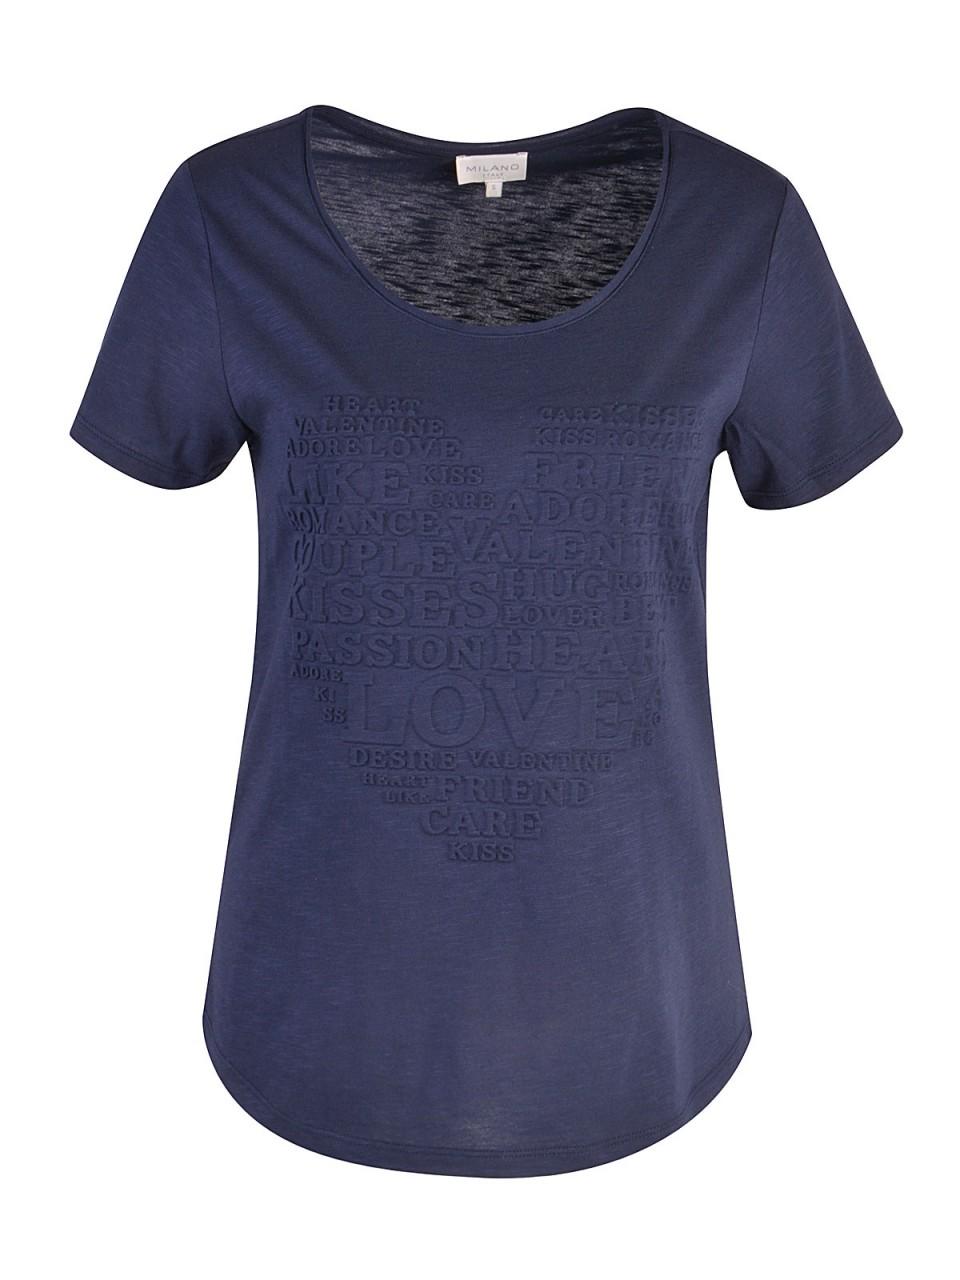 milano-italy-damen-t-shirt-dunkelblau